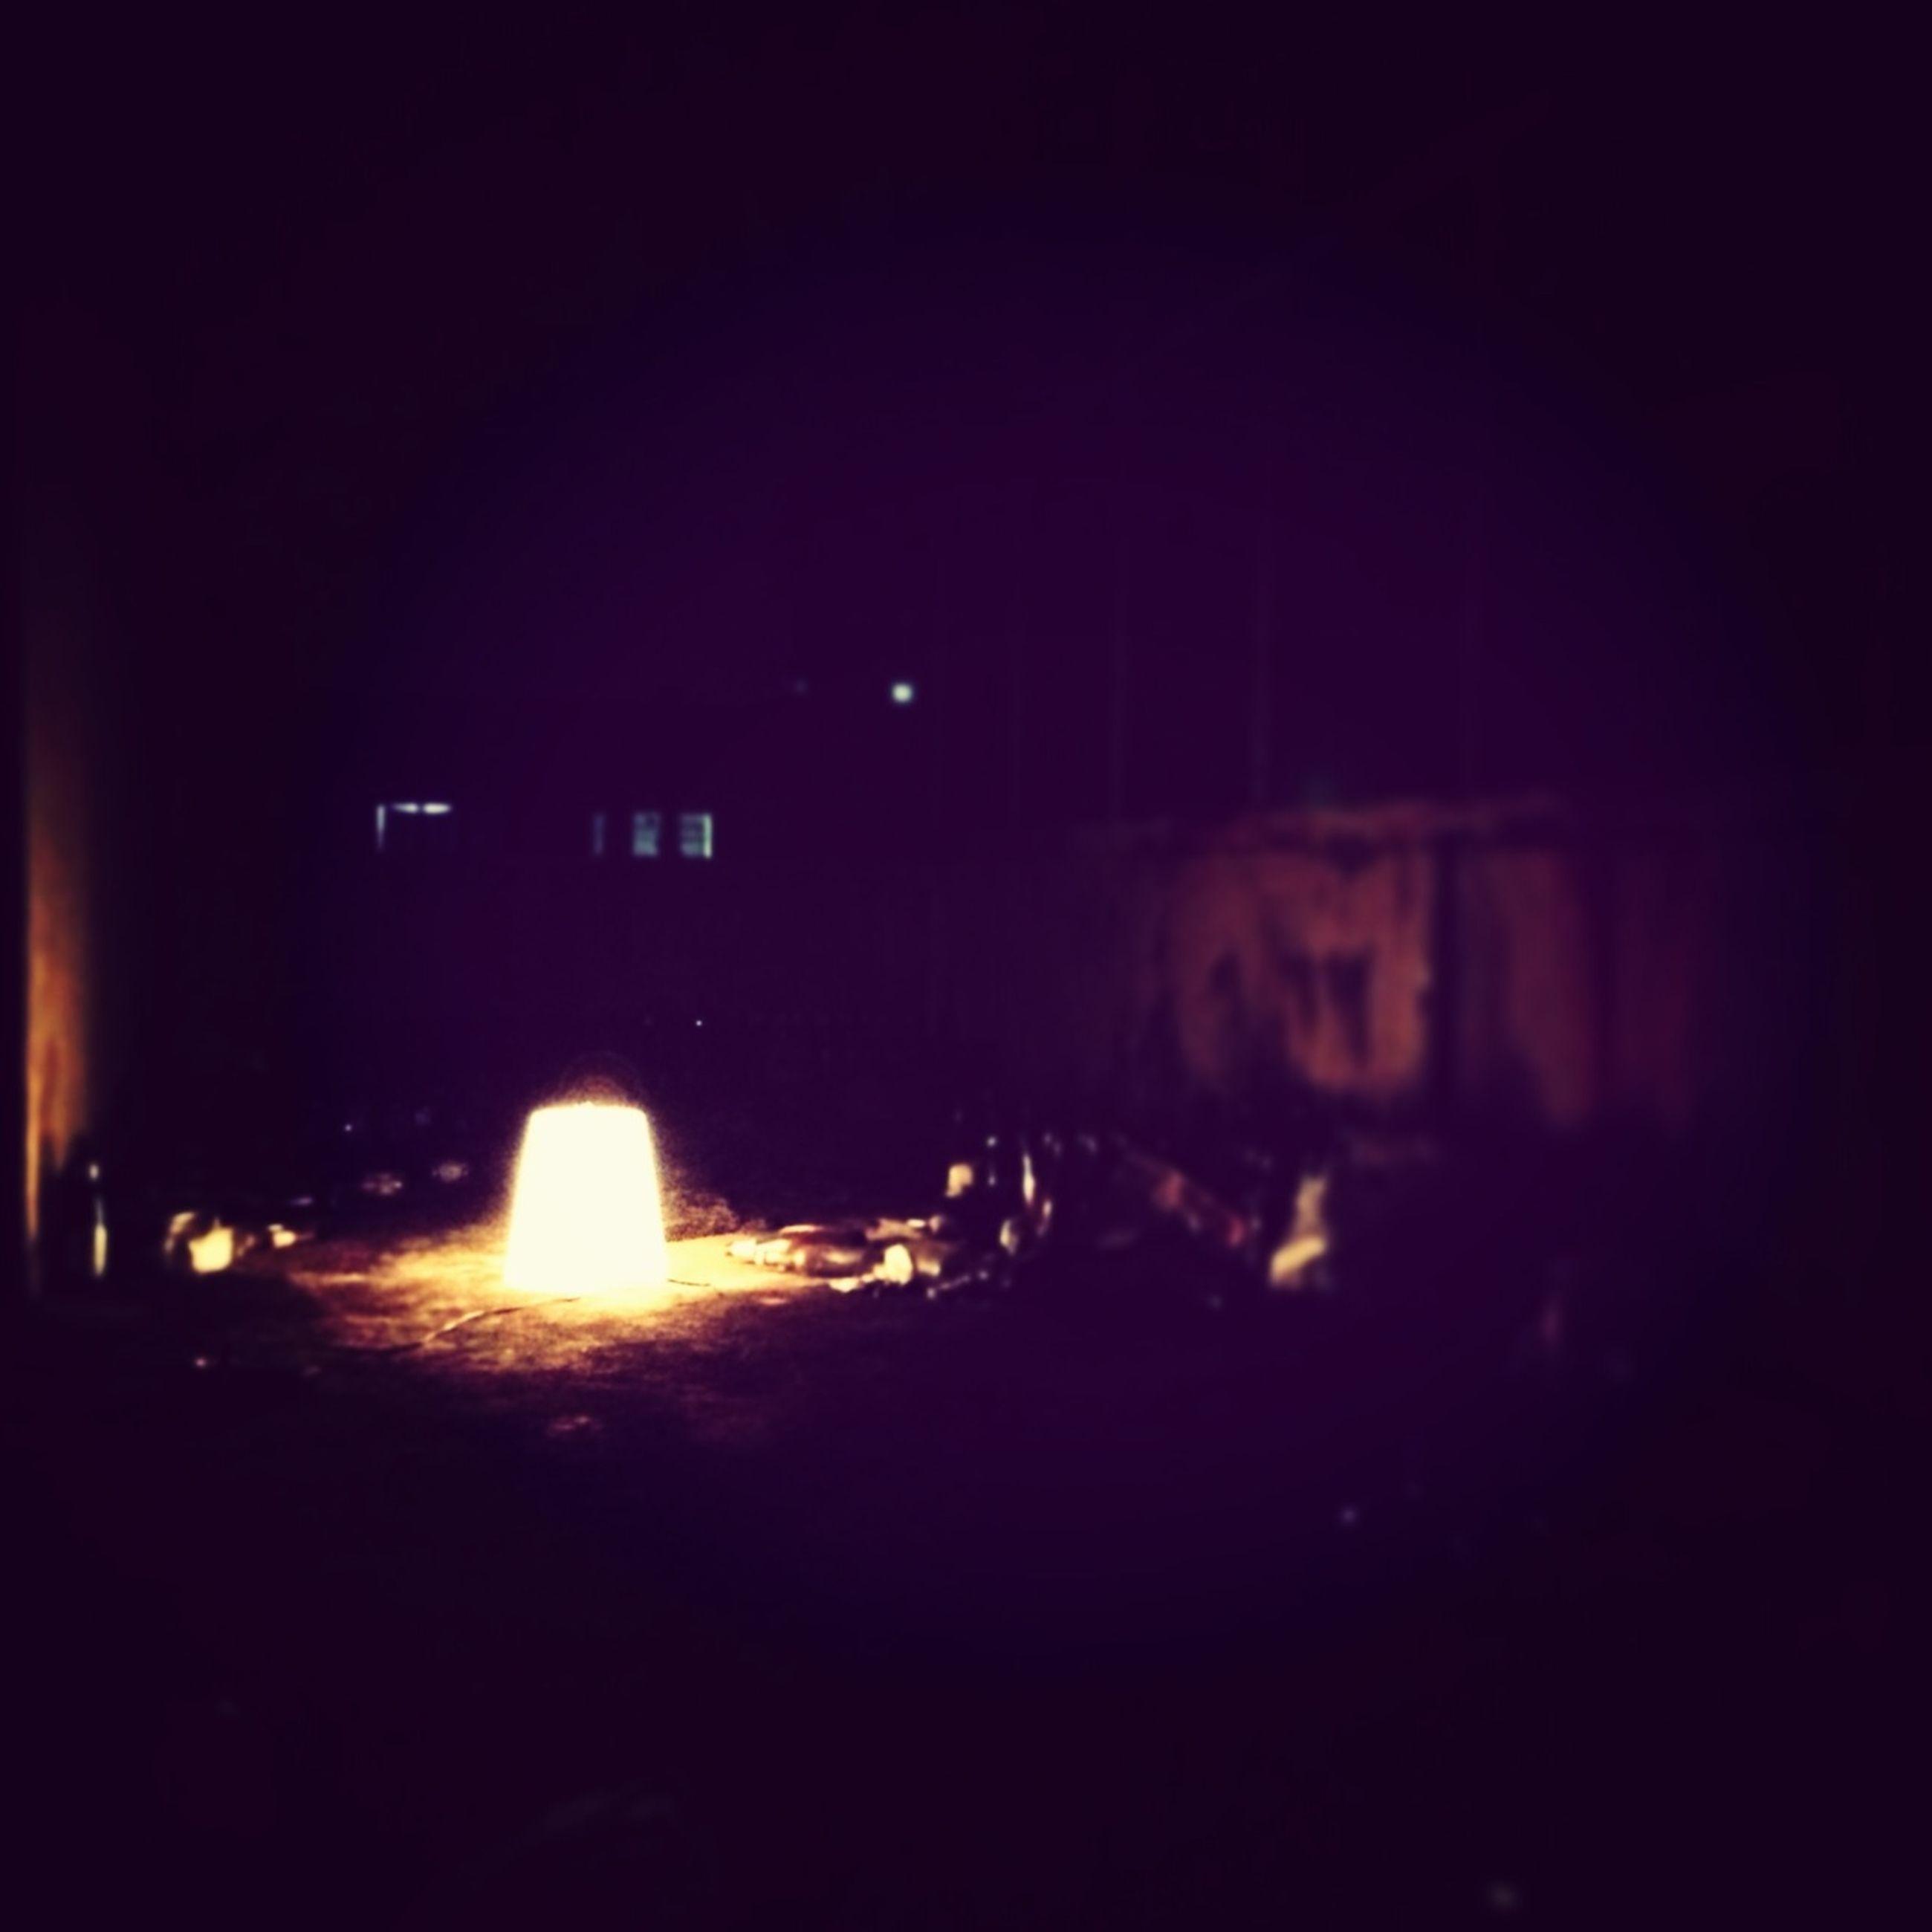 illuminated, night, dark, built structure, light - natural phenomenon, indoors, lighting equipment, architecture, glowing, copy space, building exterior, silhouette, men, darkroom, lit, flame, light, unrecognizable person